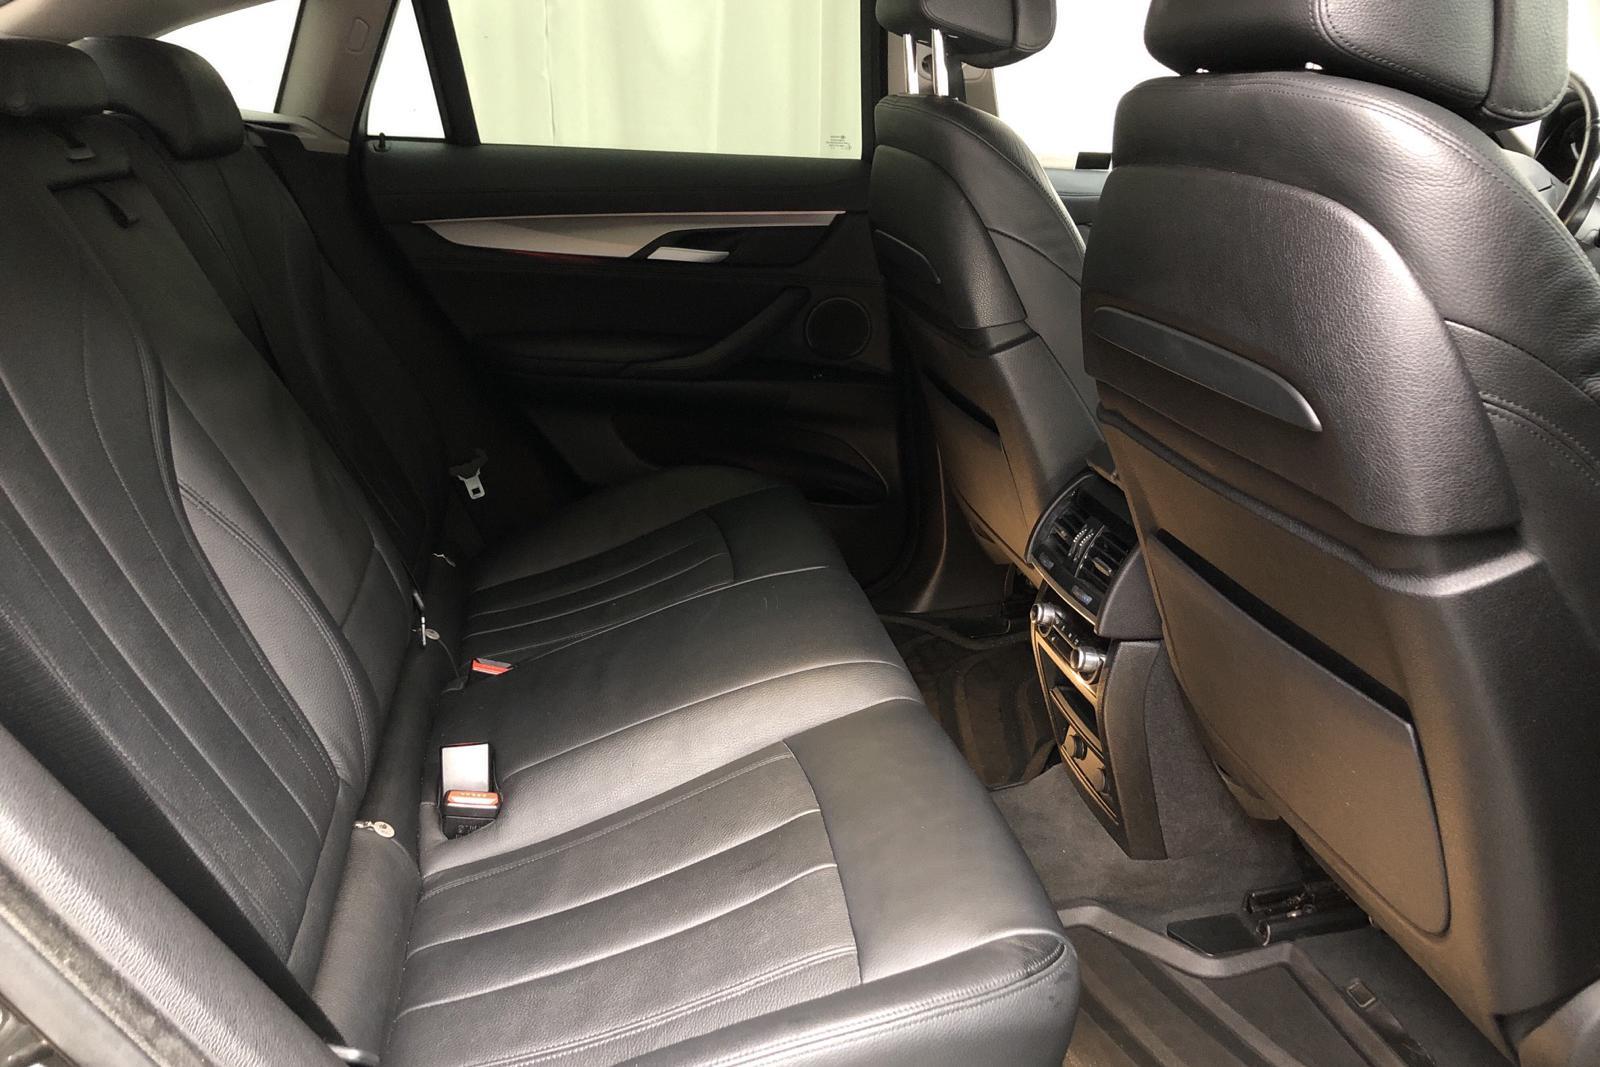 BMW X6 xDrive 40d, F16 (313hk) - 180 580 km - Automatic - brown - 2015